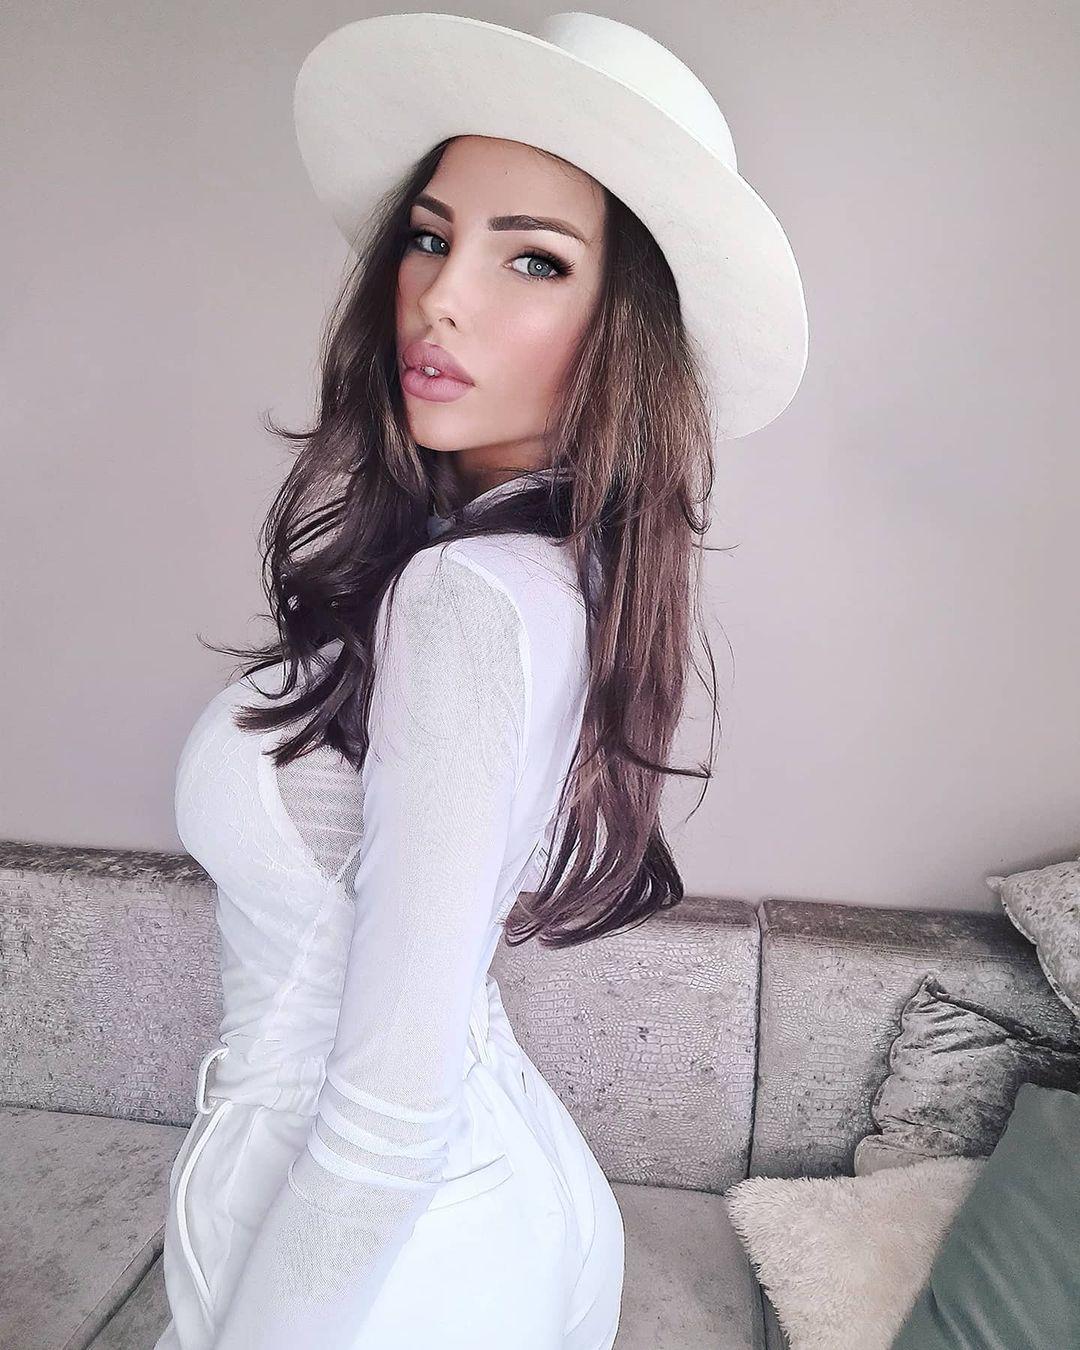 Elizaveta-Berejnaya-Wallpapers-Insta-Fit-Bio-Miss-elizabeth-sol-Wallpapers-Insta-Fit-Bio-17